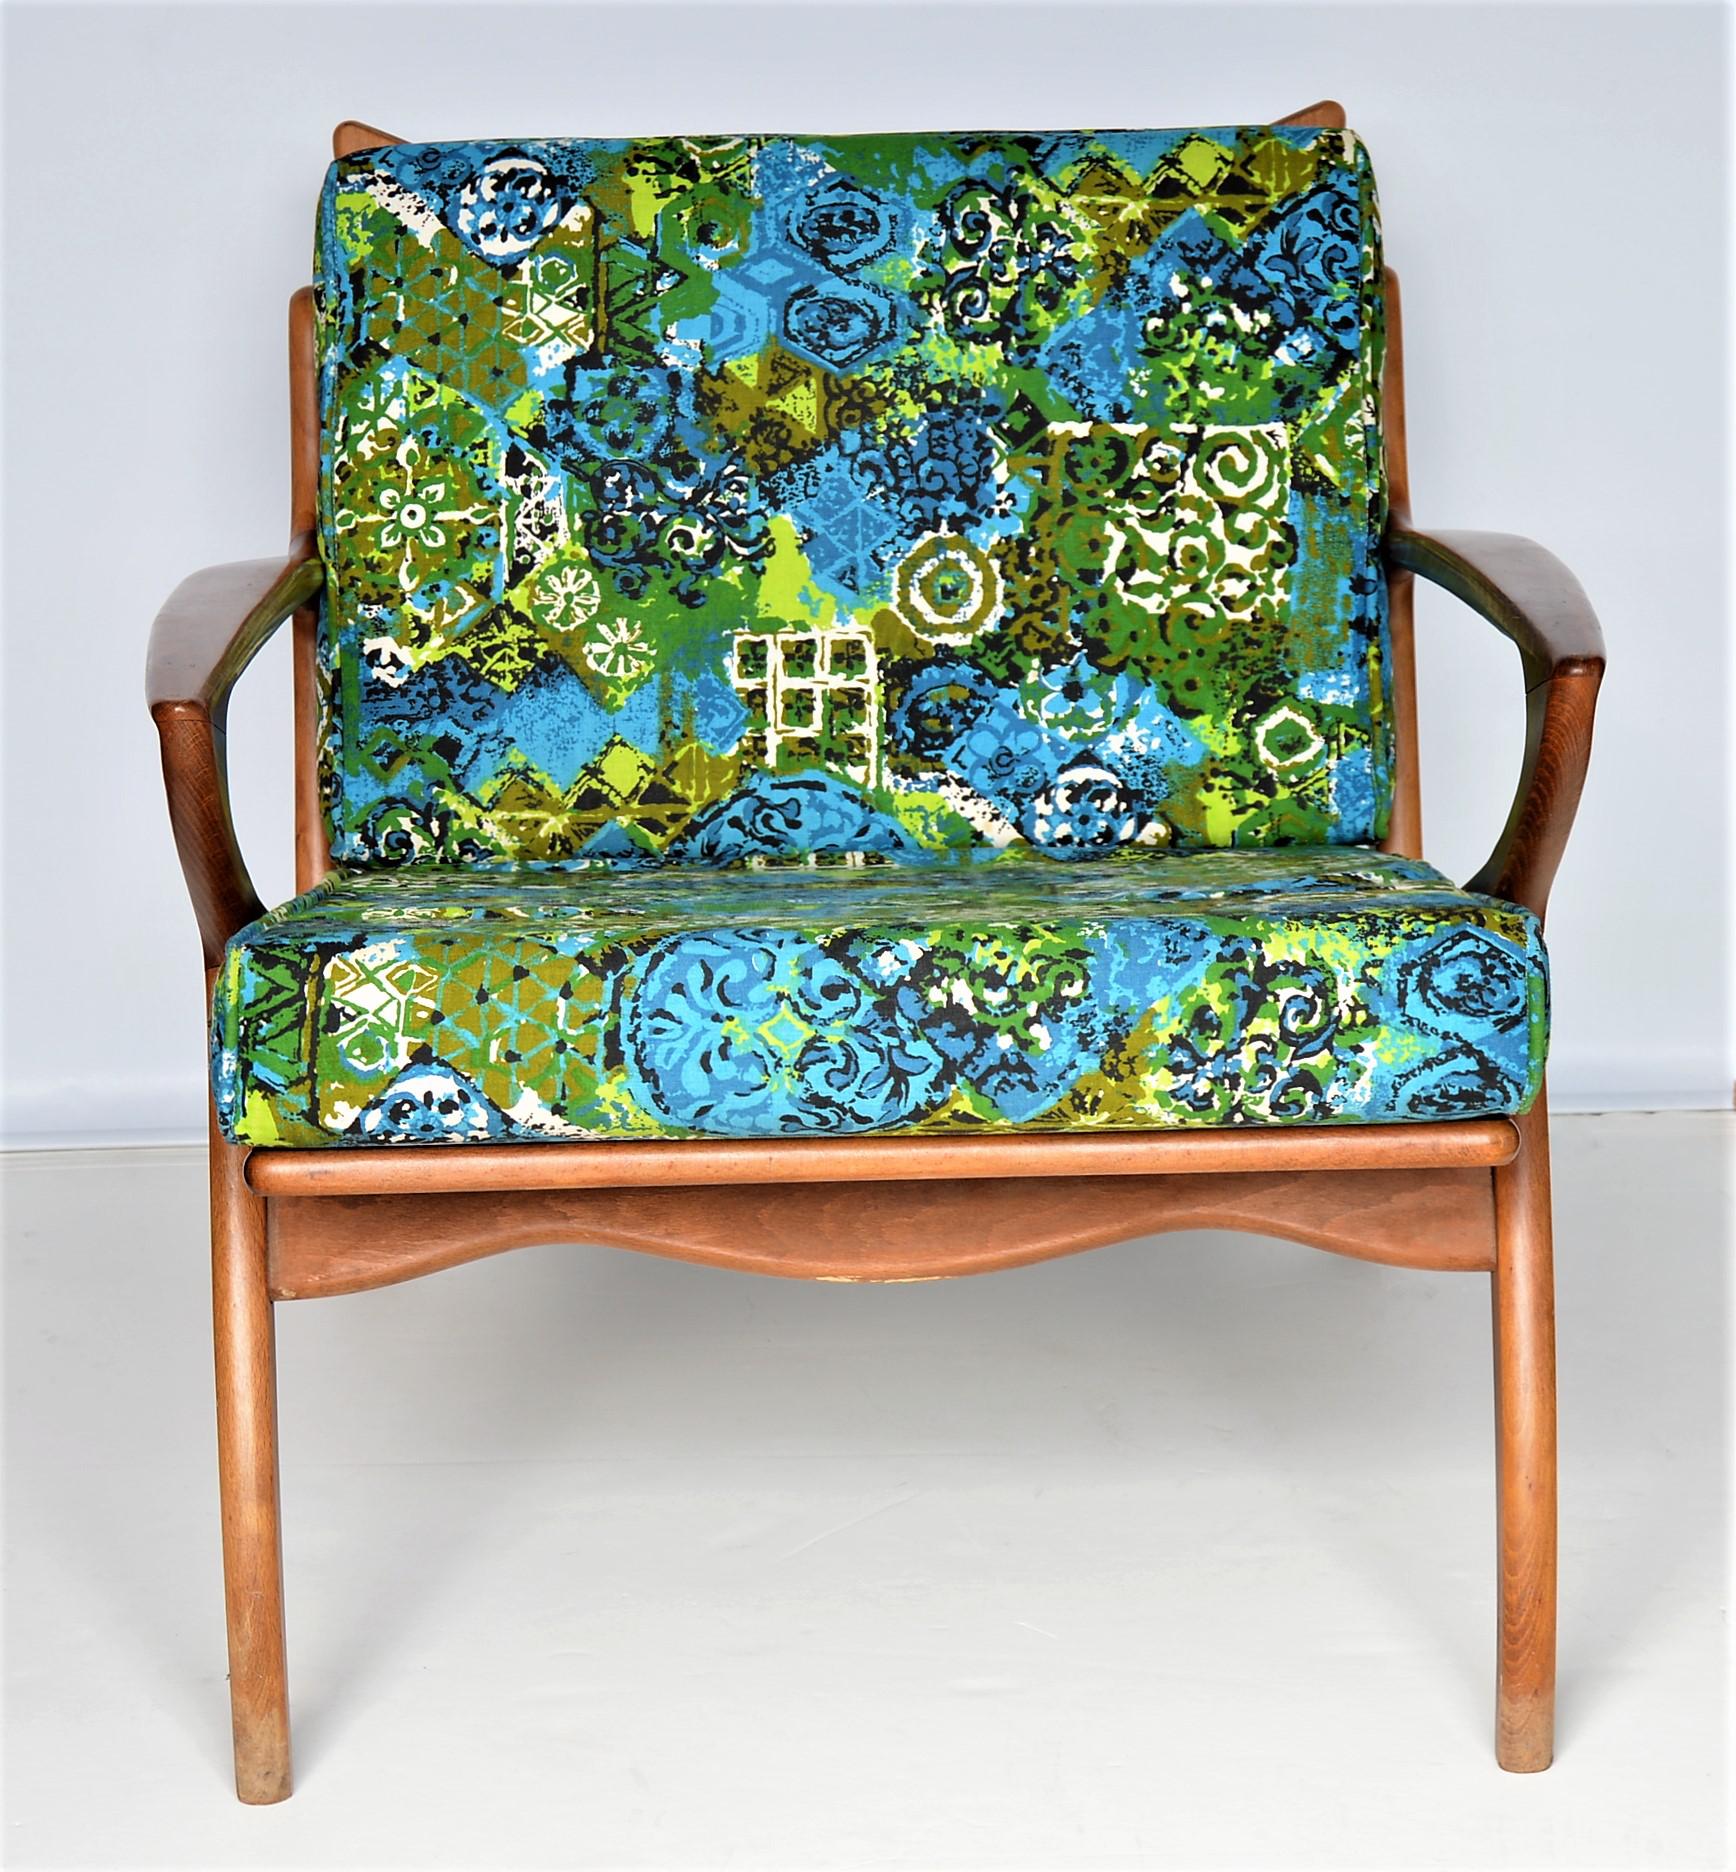 Boho Chic Mid Century Danish Modern Solid Teak Selig Style Lounge Chair    MCM Tropical